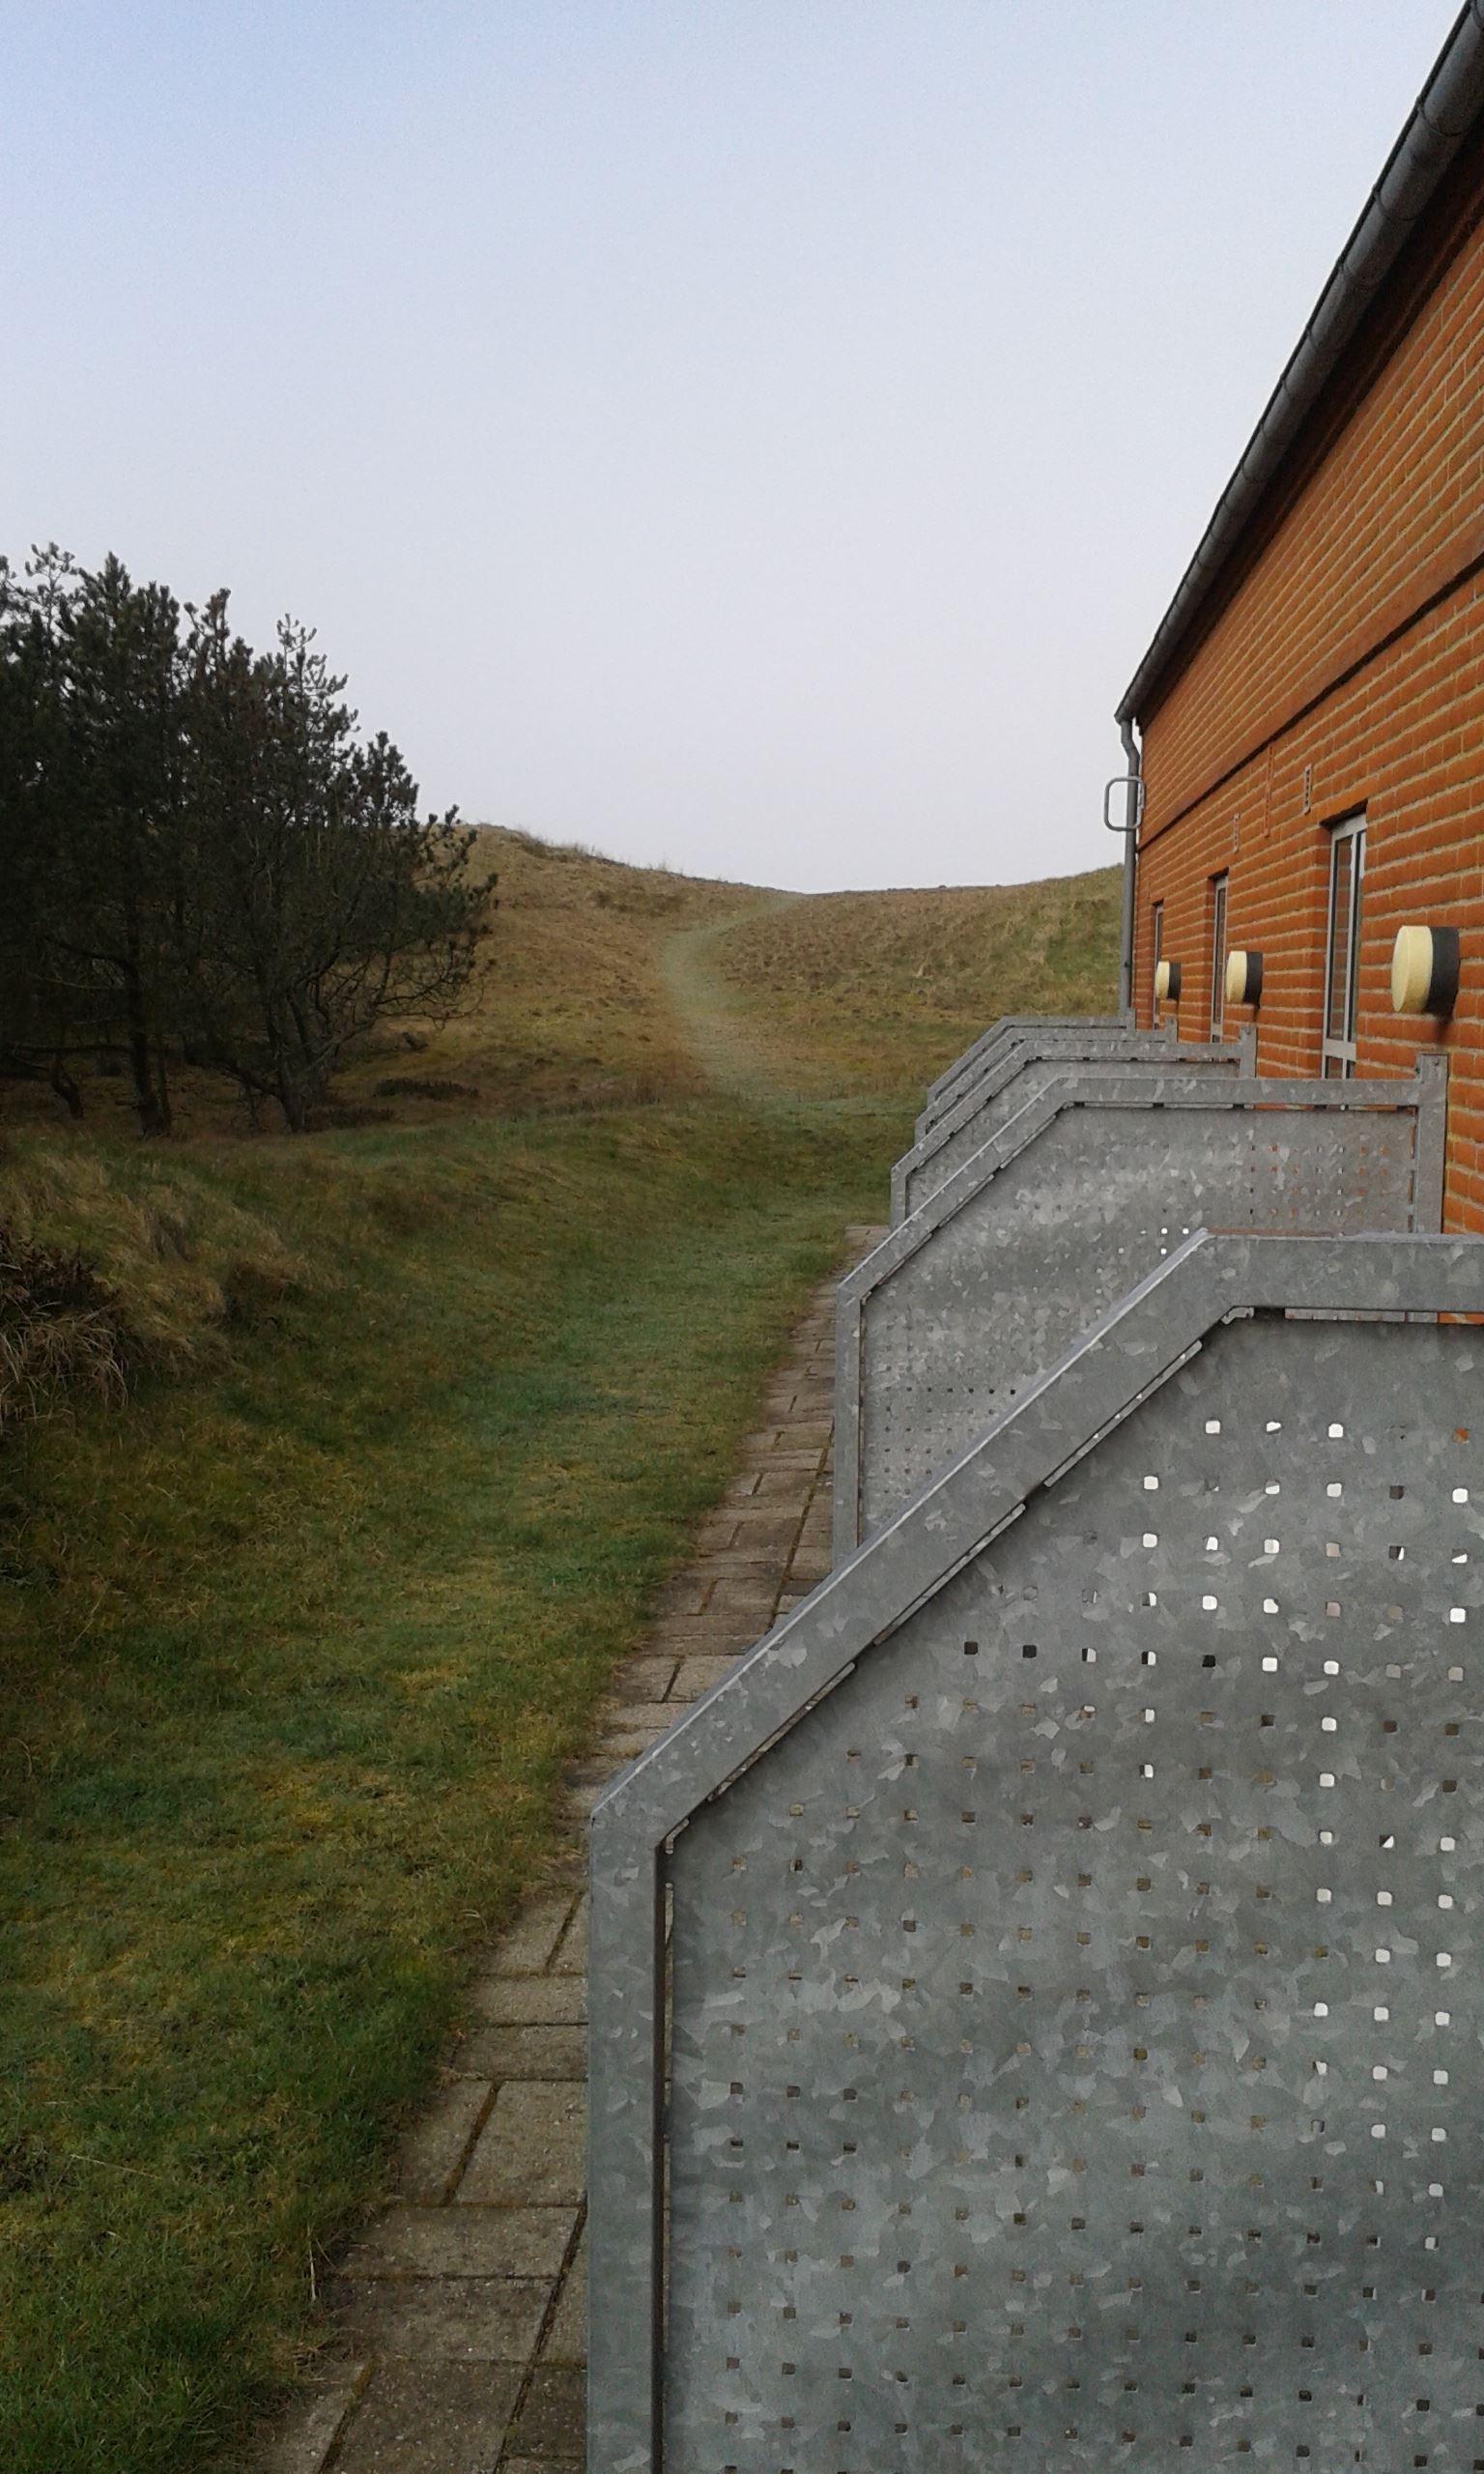 KlithusMandø